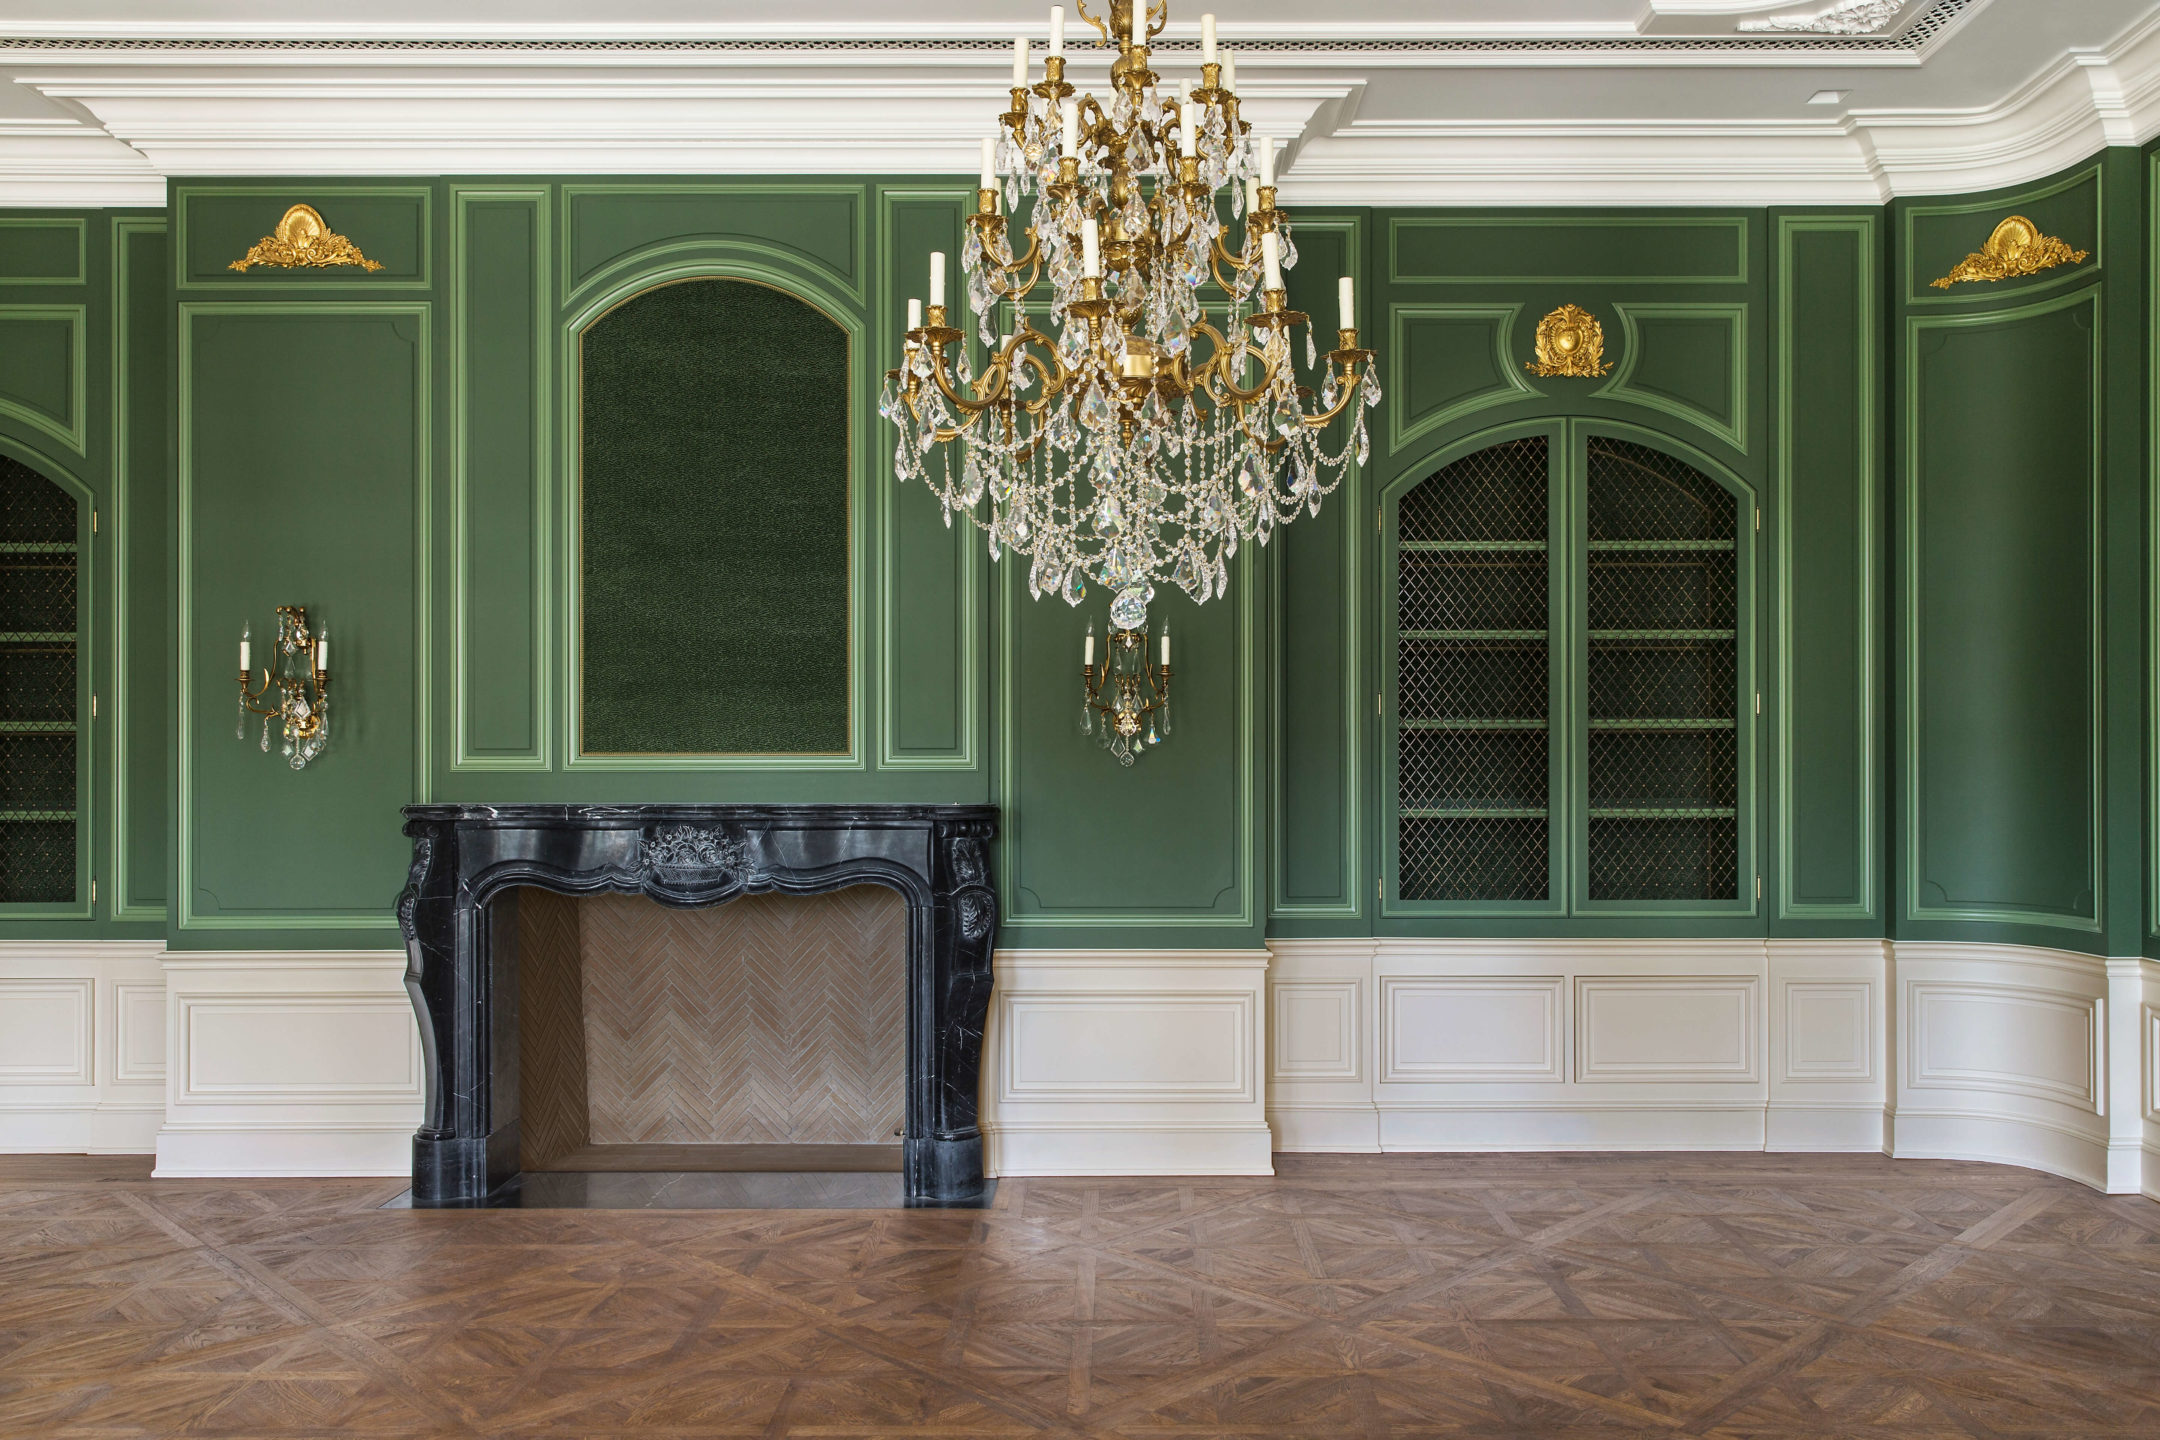 studio-william-hefner-chateau-des-fleurs-18